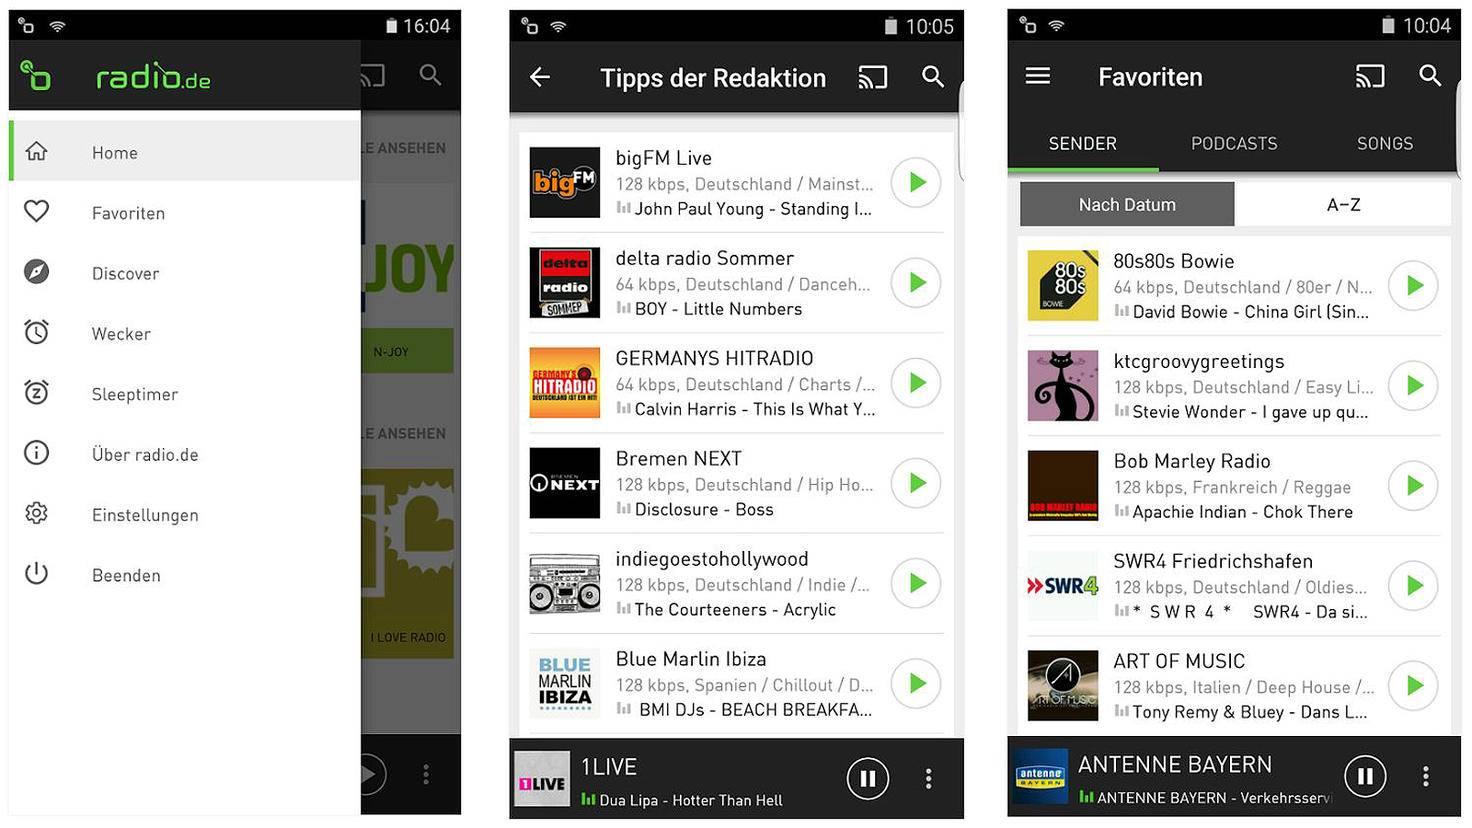 Radio-de-Google Play Store-Radio.de GmbH